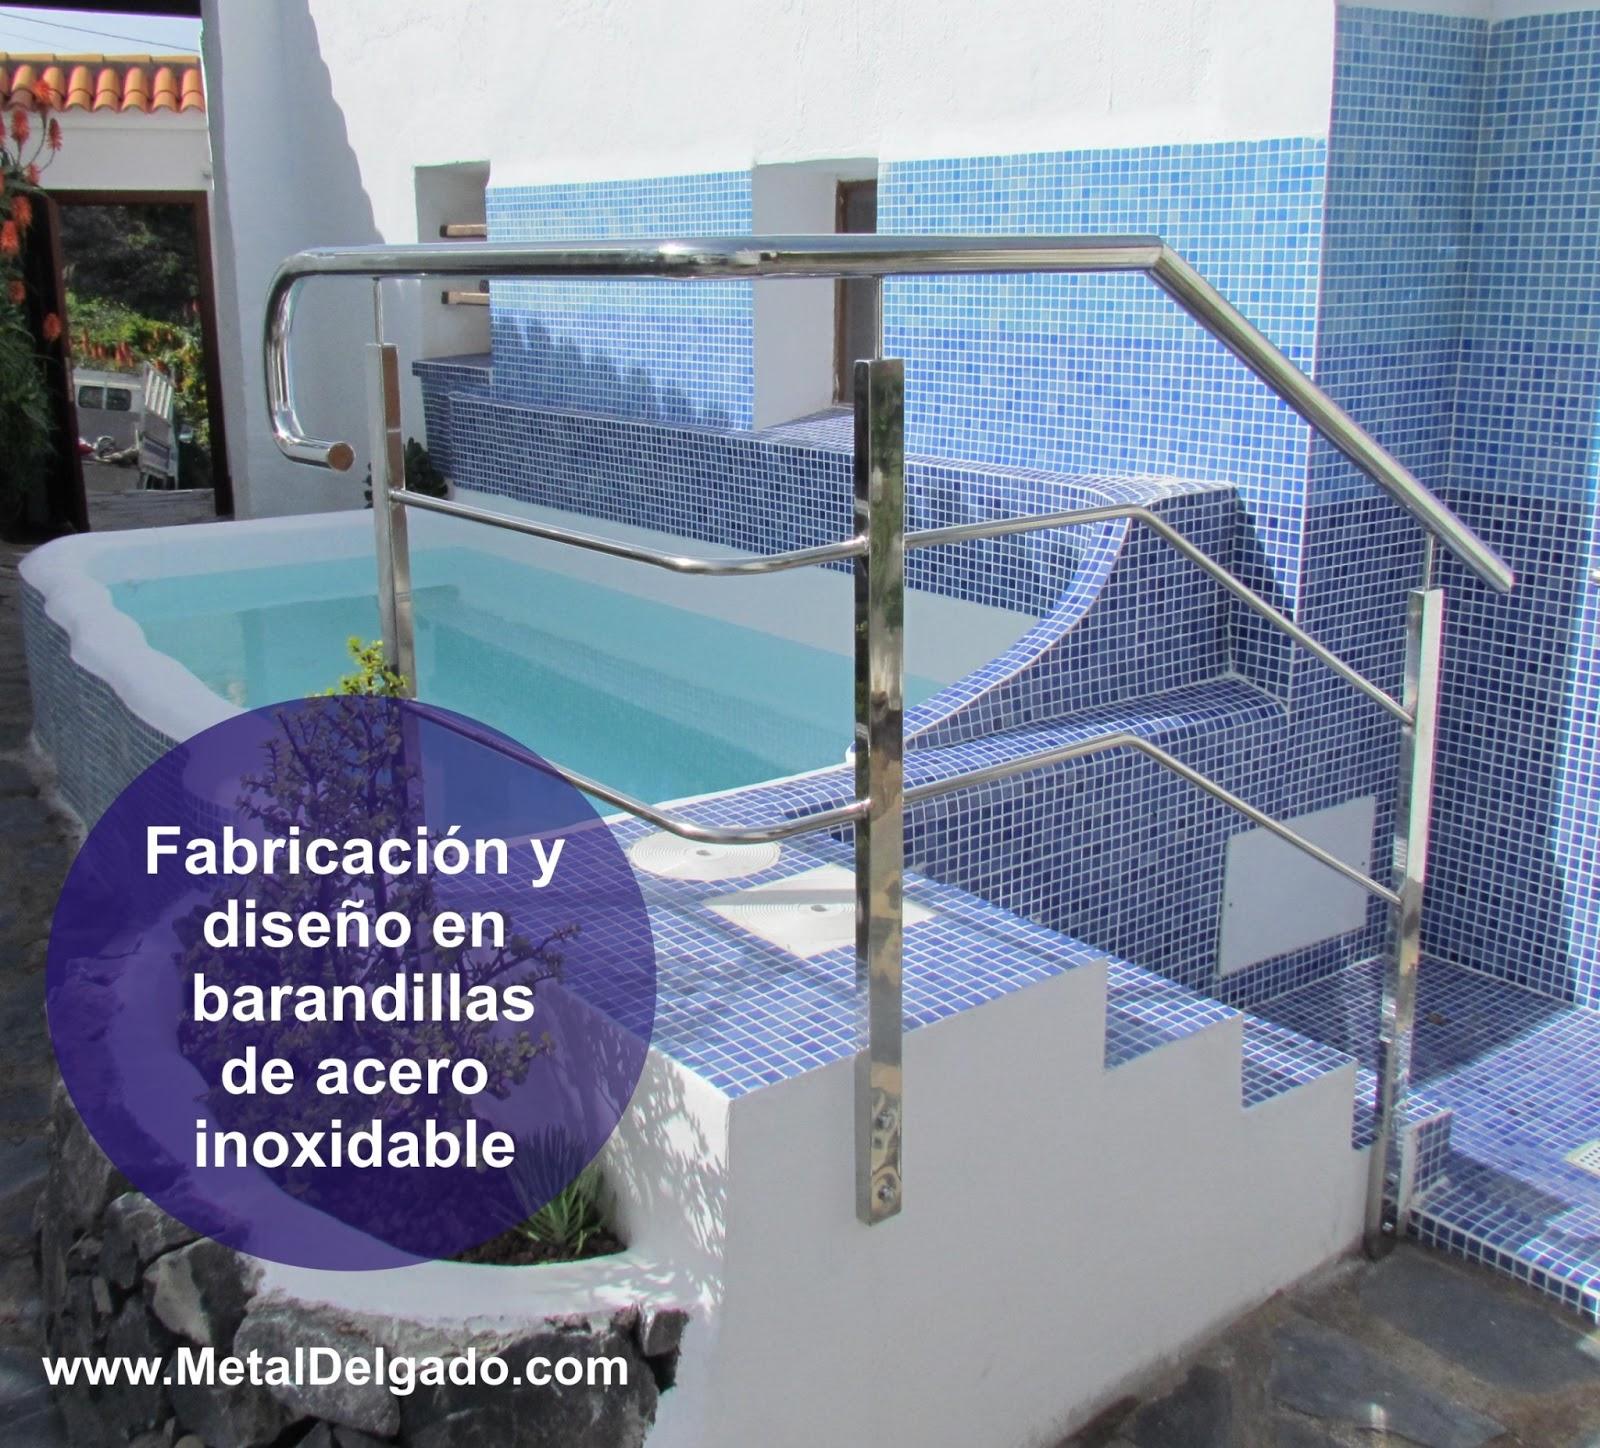 Acero inoxidable tenerife fabricaci n de barandas de - Fabricacion de piscinas ...